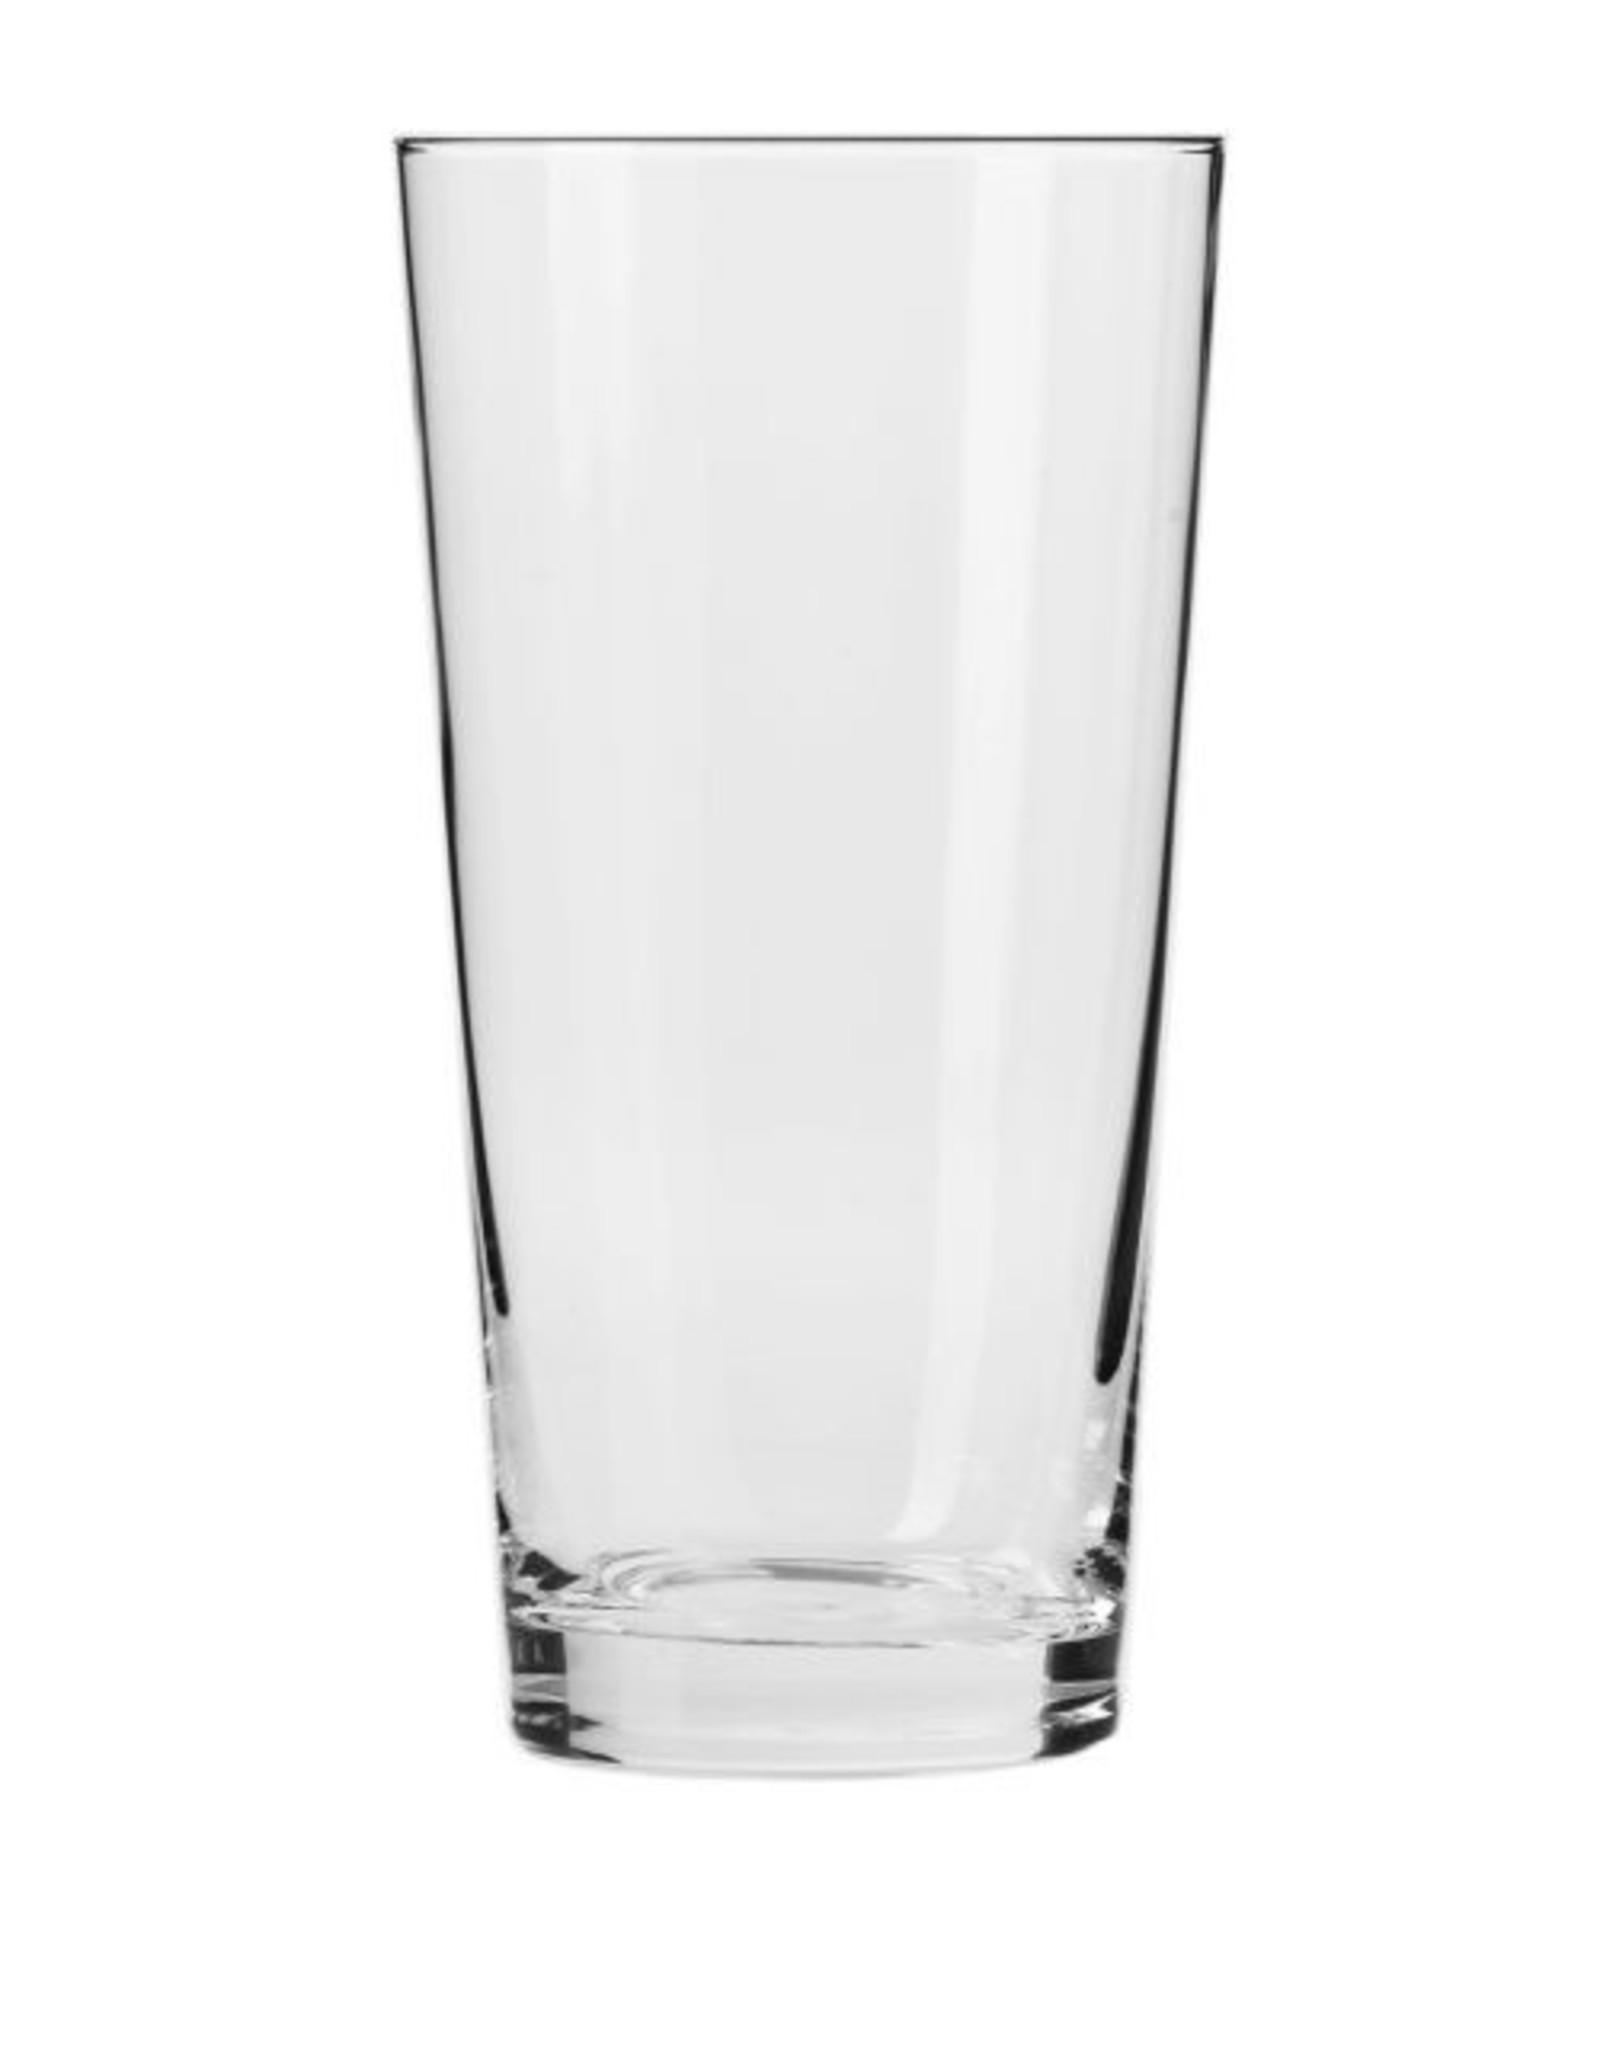 Krosno crystal glasses